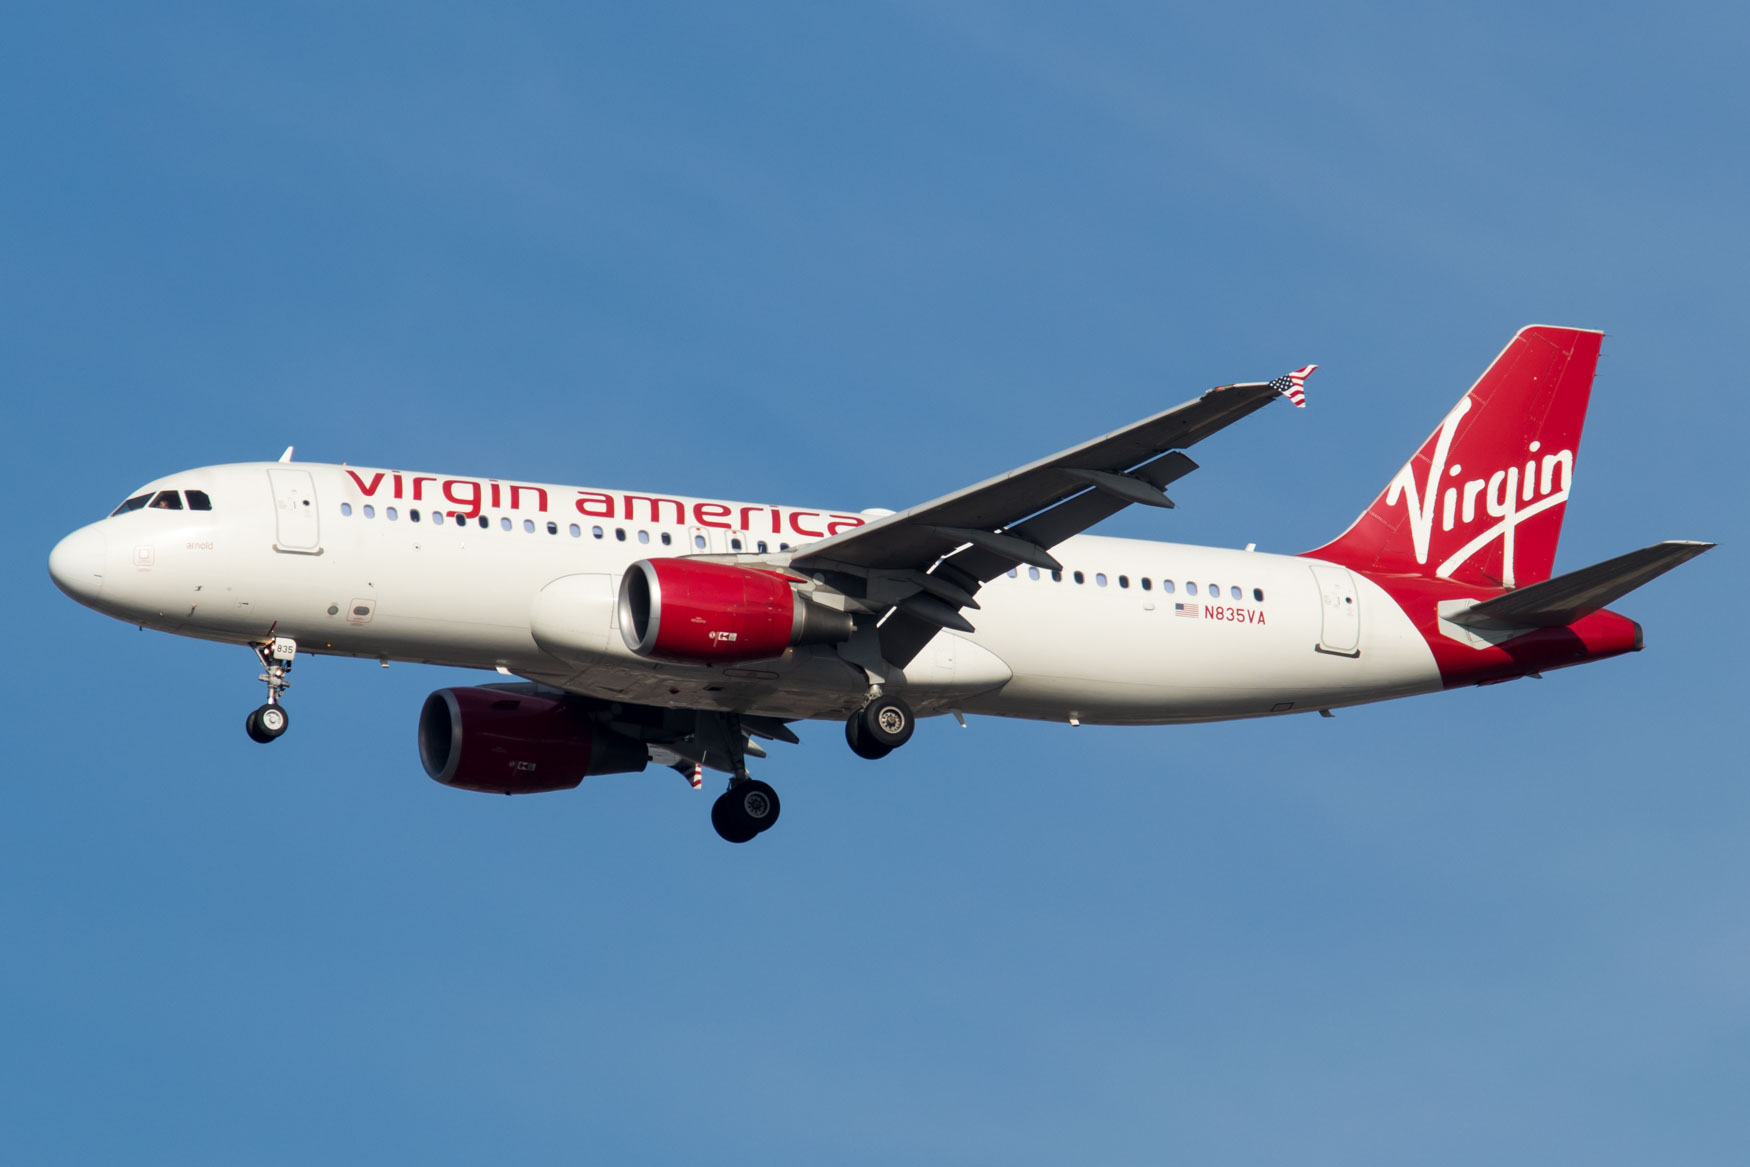 Virgin America Airbus A320 Landing at JFK